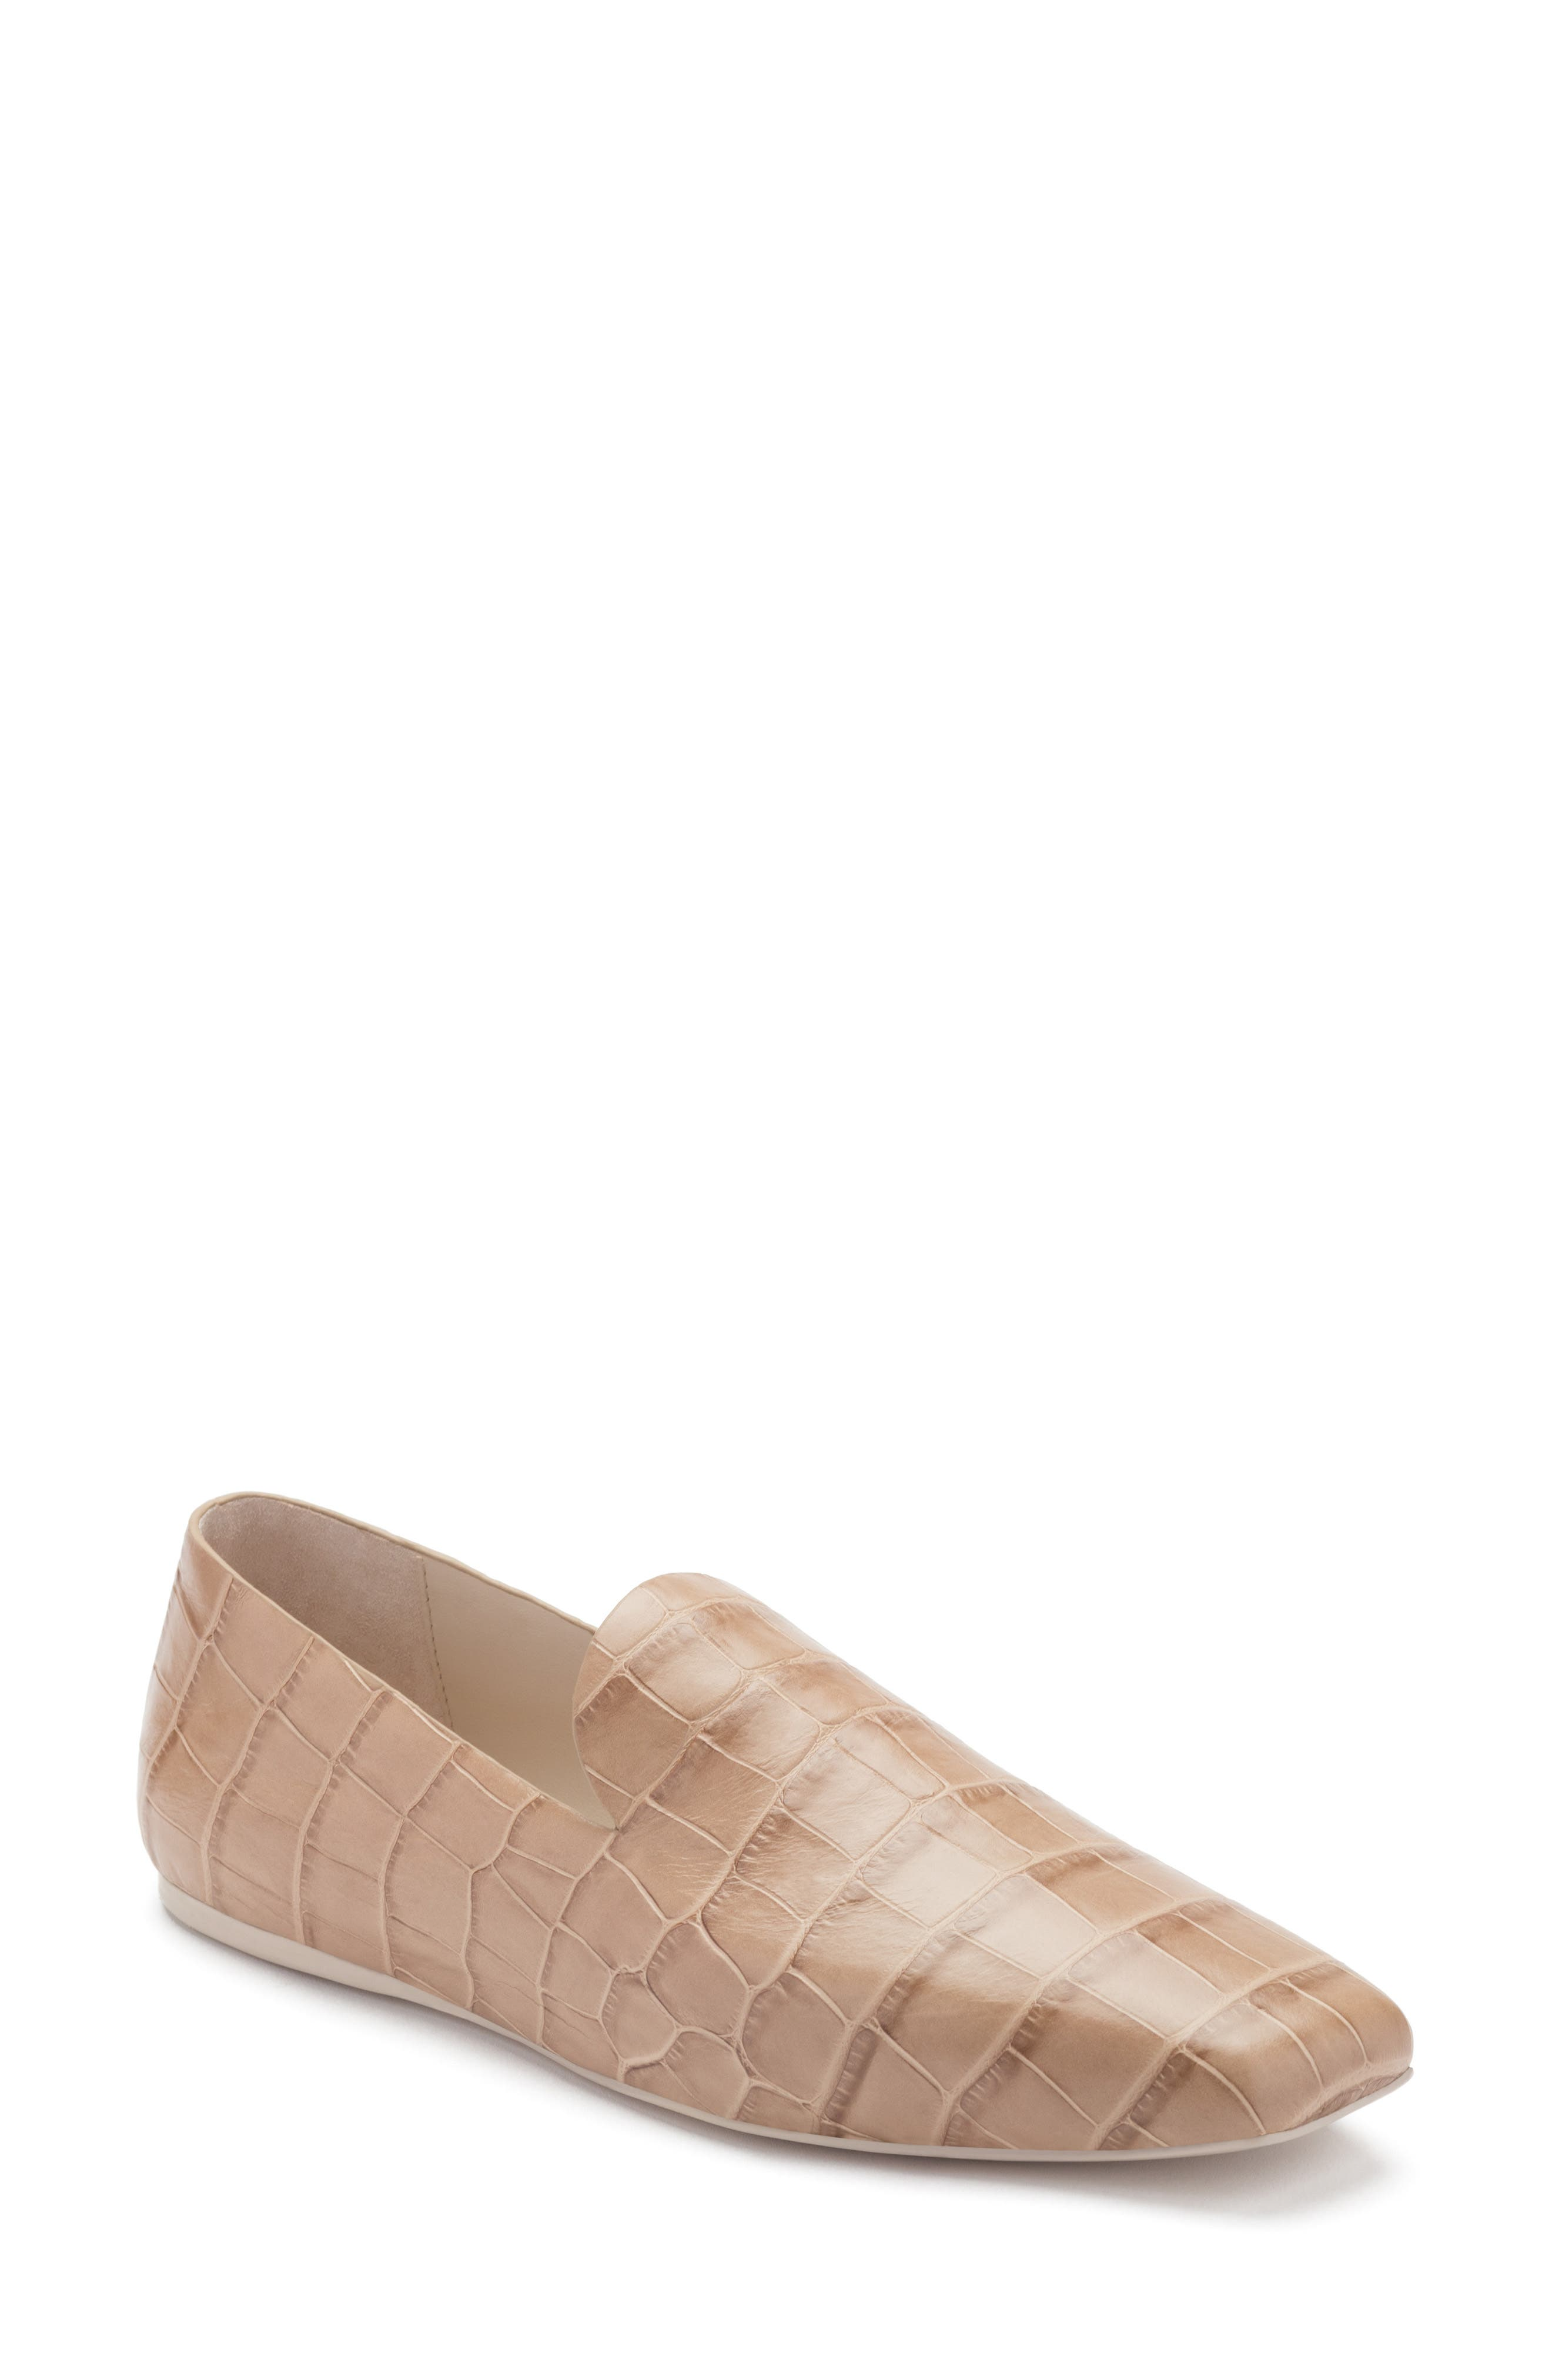 Cora Croc Embossed Flat